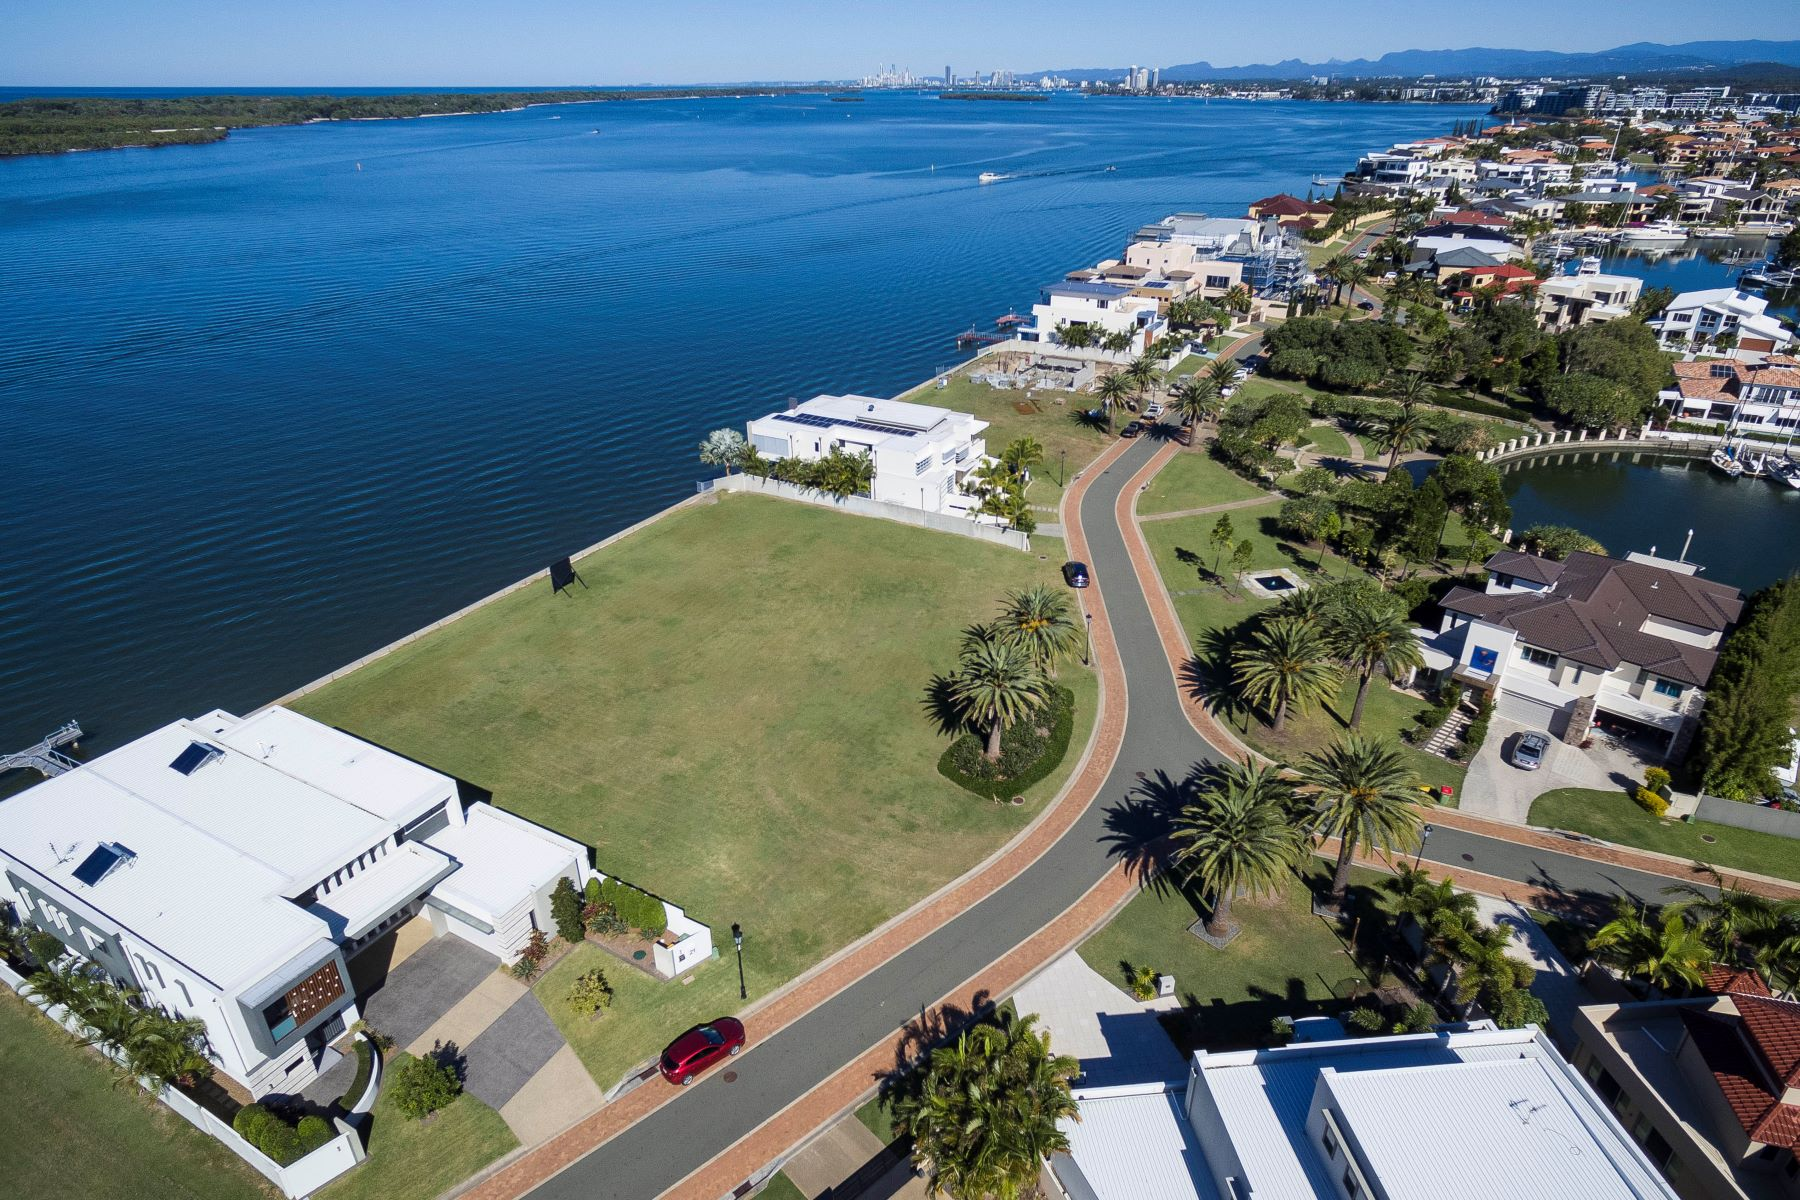 Terreno per Vendita alle ore 15-19 Parklane Terrace Gold Coast, Queensland, 4216 Australia